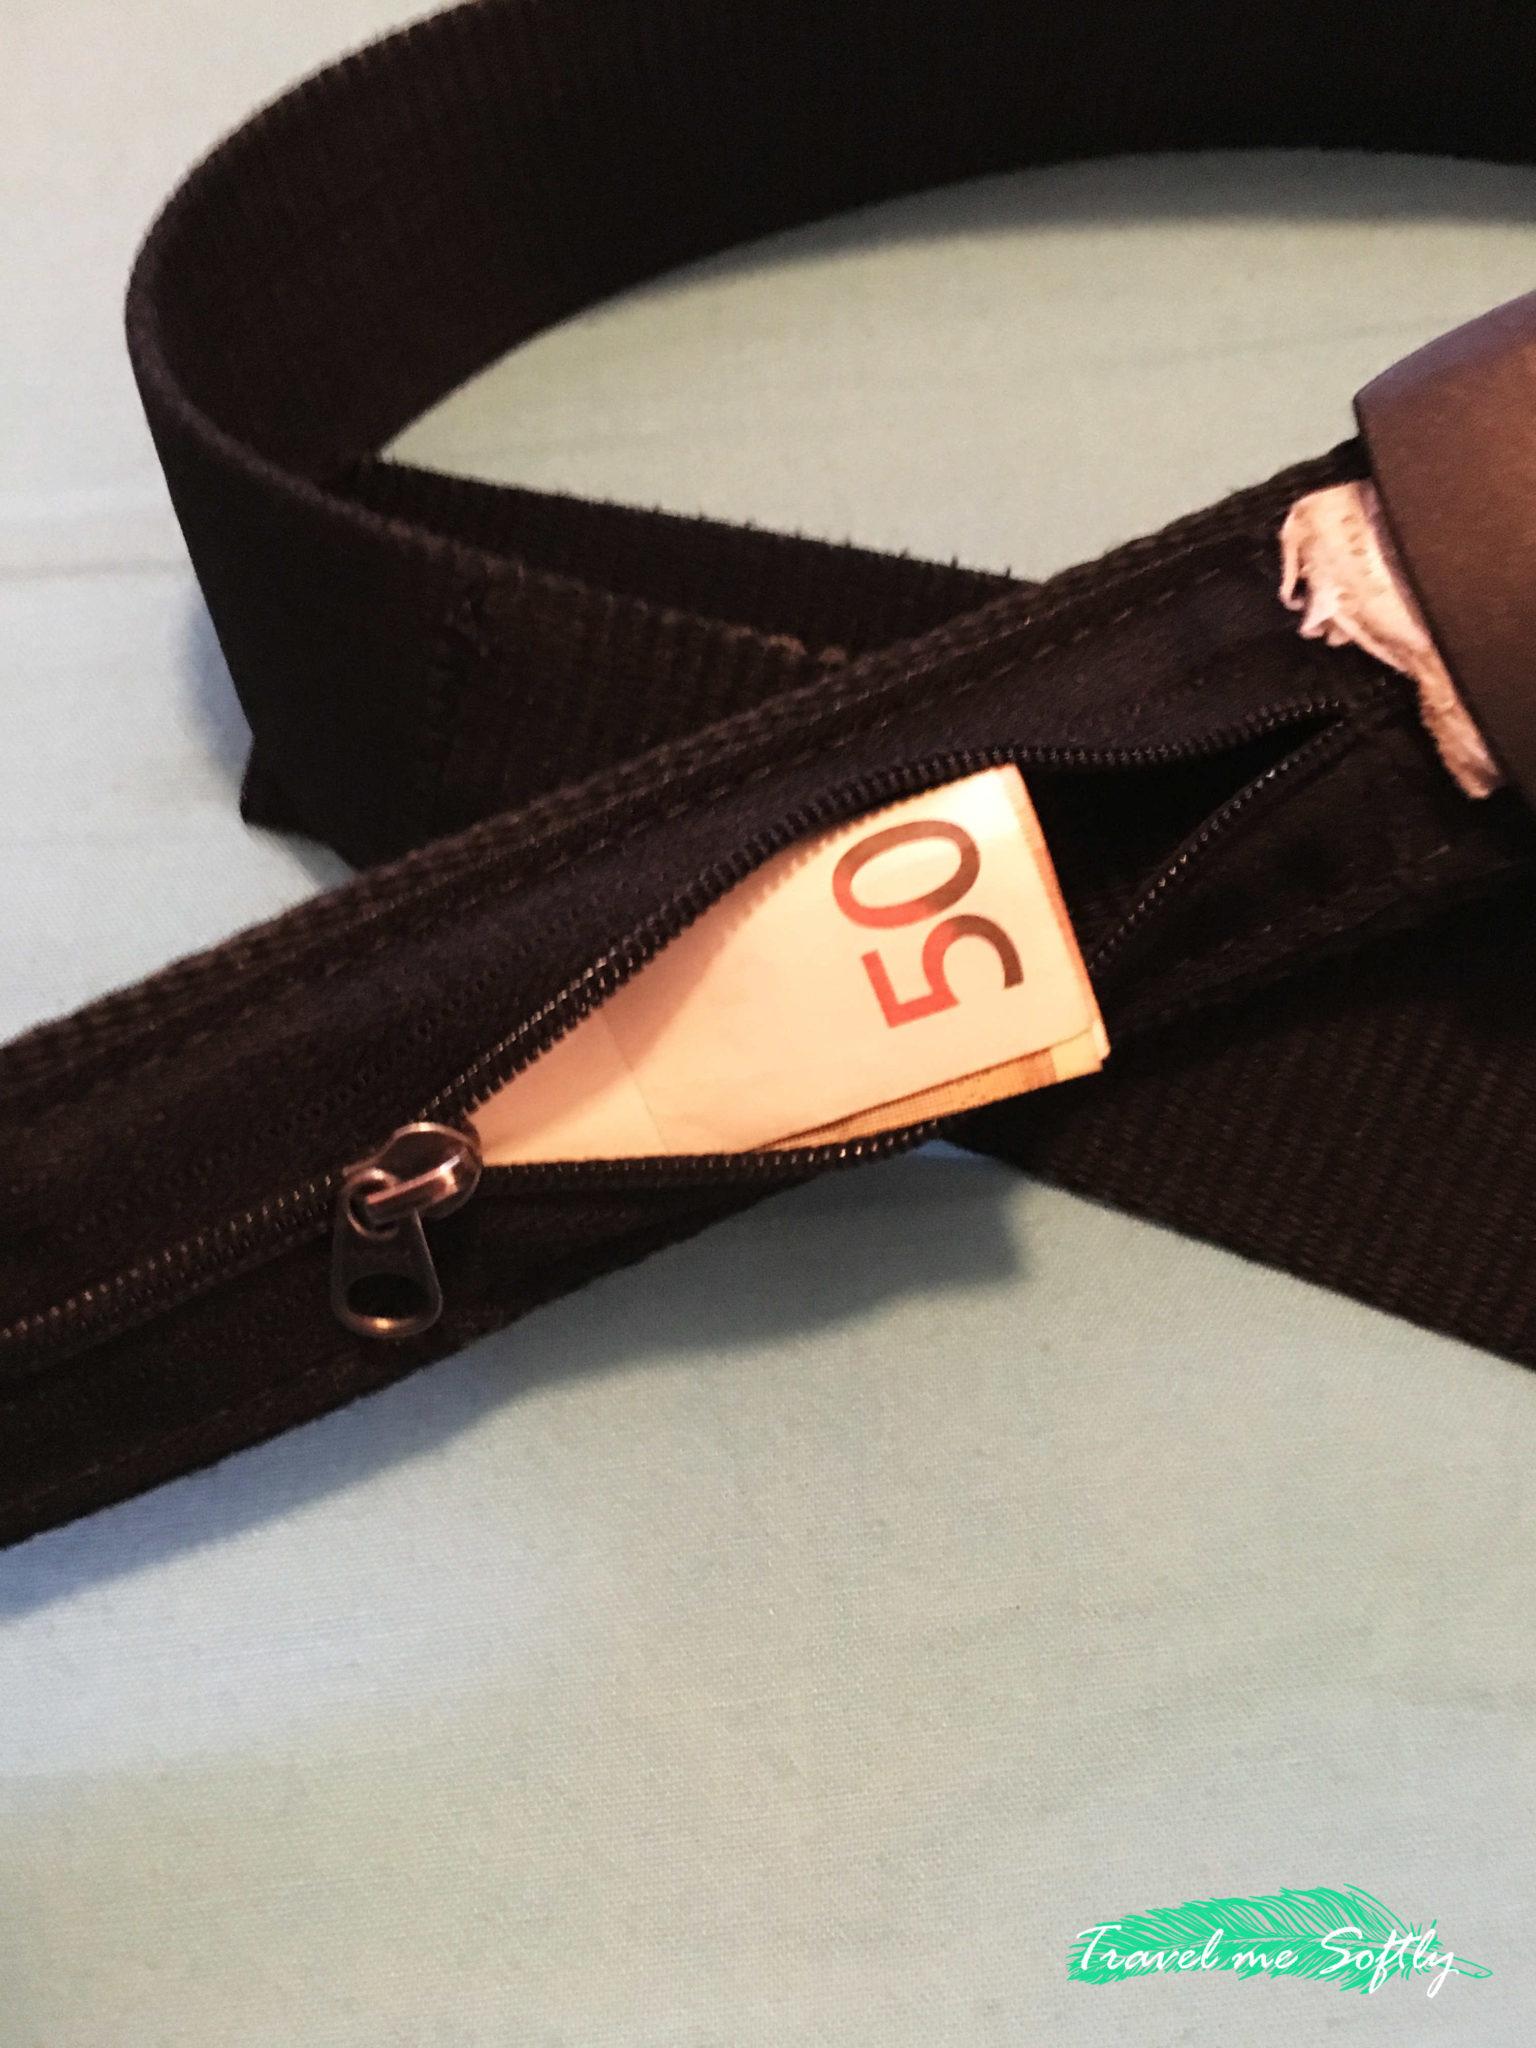 consejos de seguridad para viajar cinturon bolsillo secreto